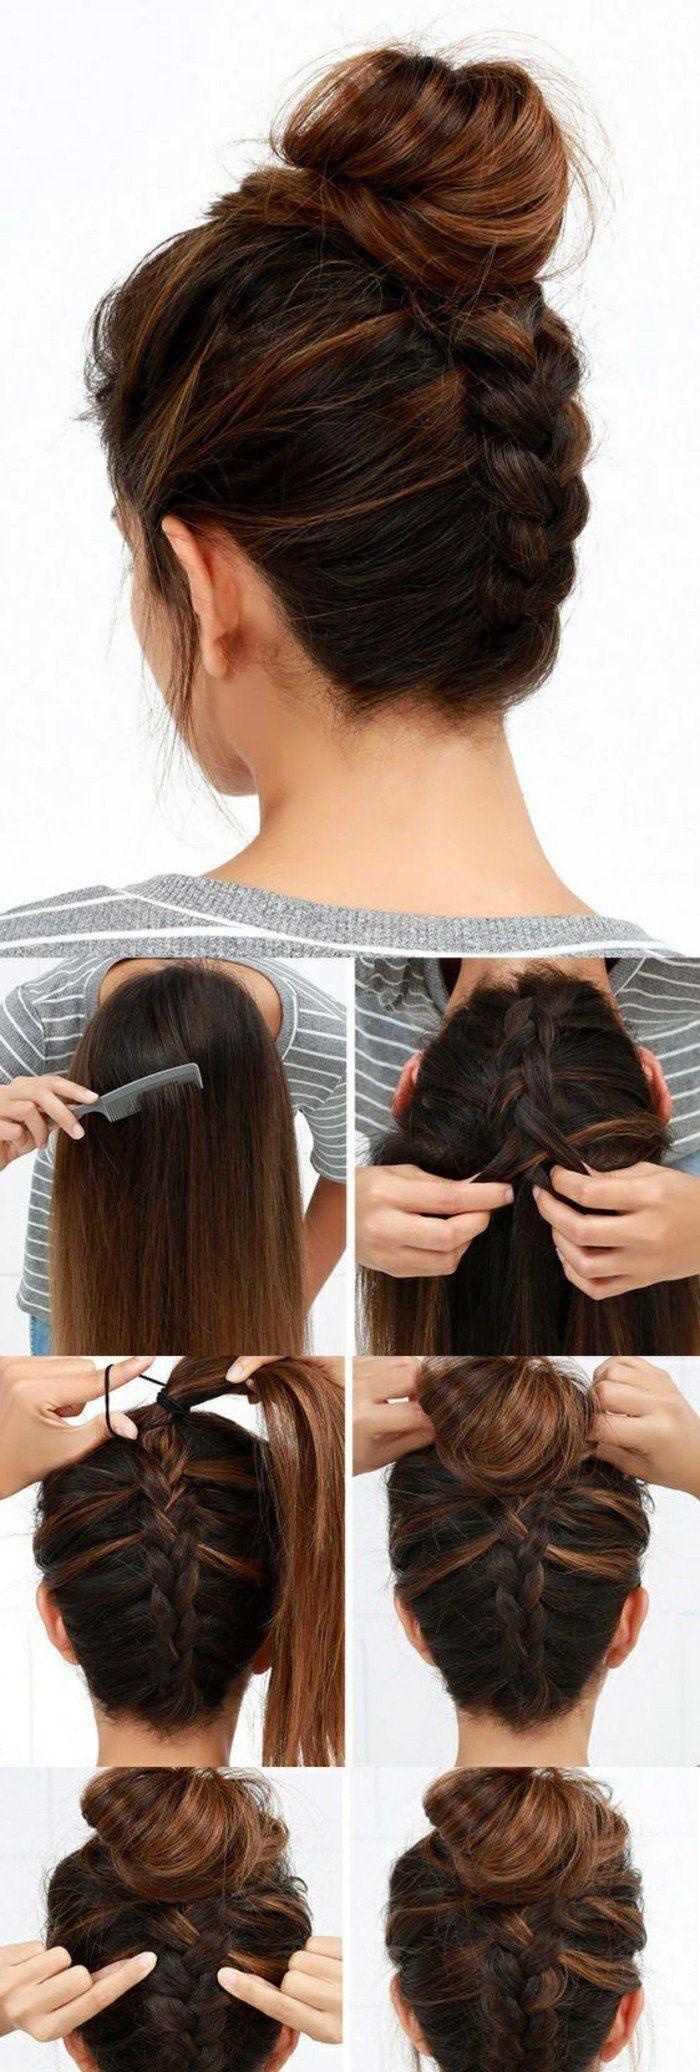 best frisuren images on pinterest hair dos color schemes and